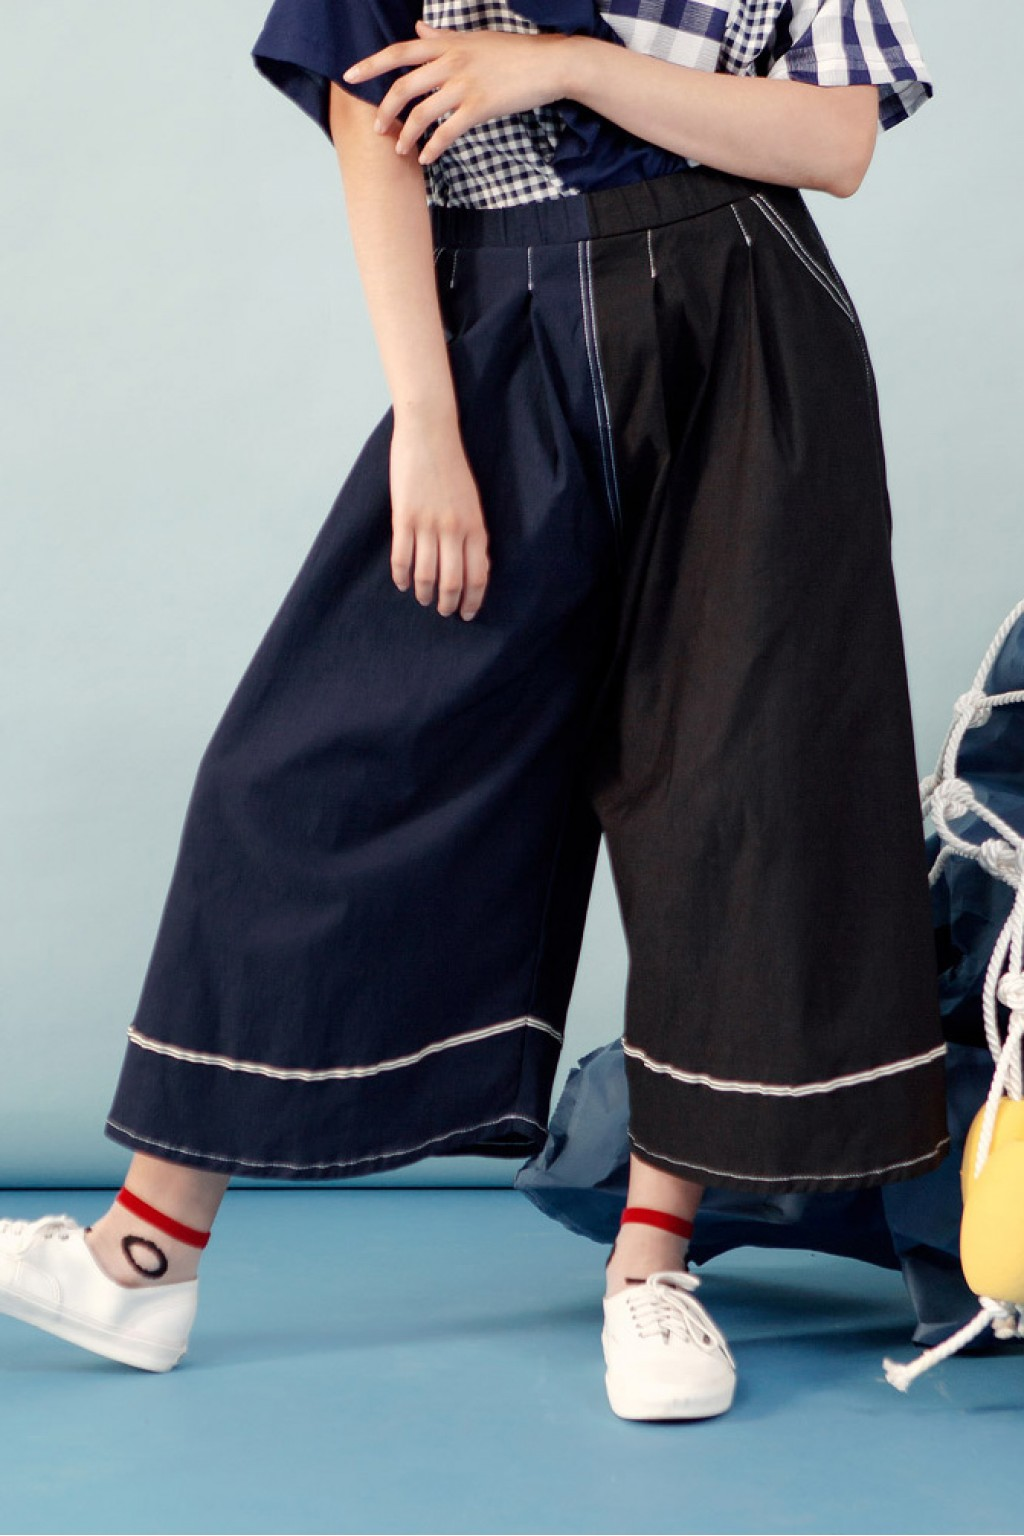 #PopbelaOOTD: Rekomendasi Celana Modis untuk Tubuh Berisi